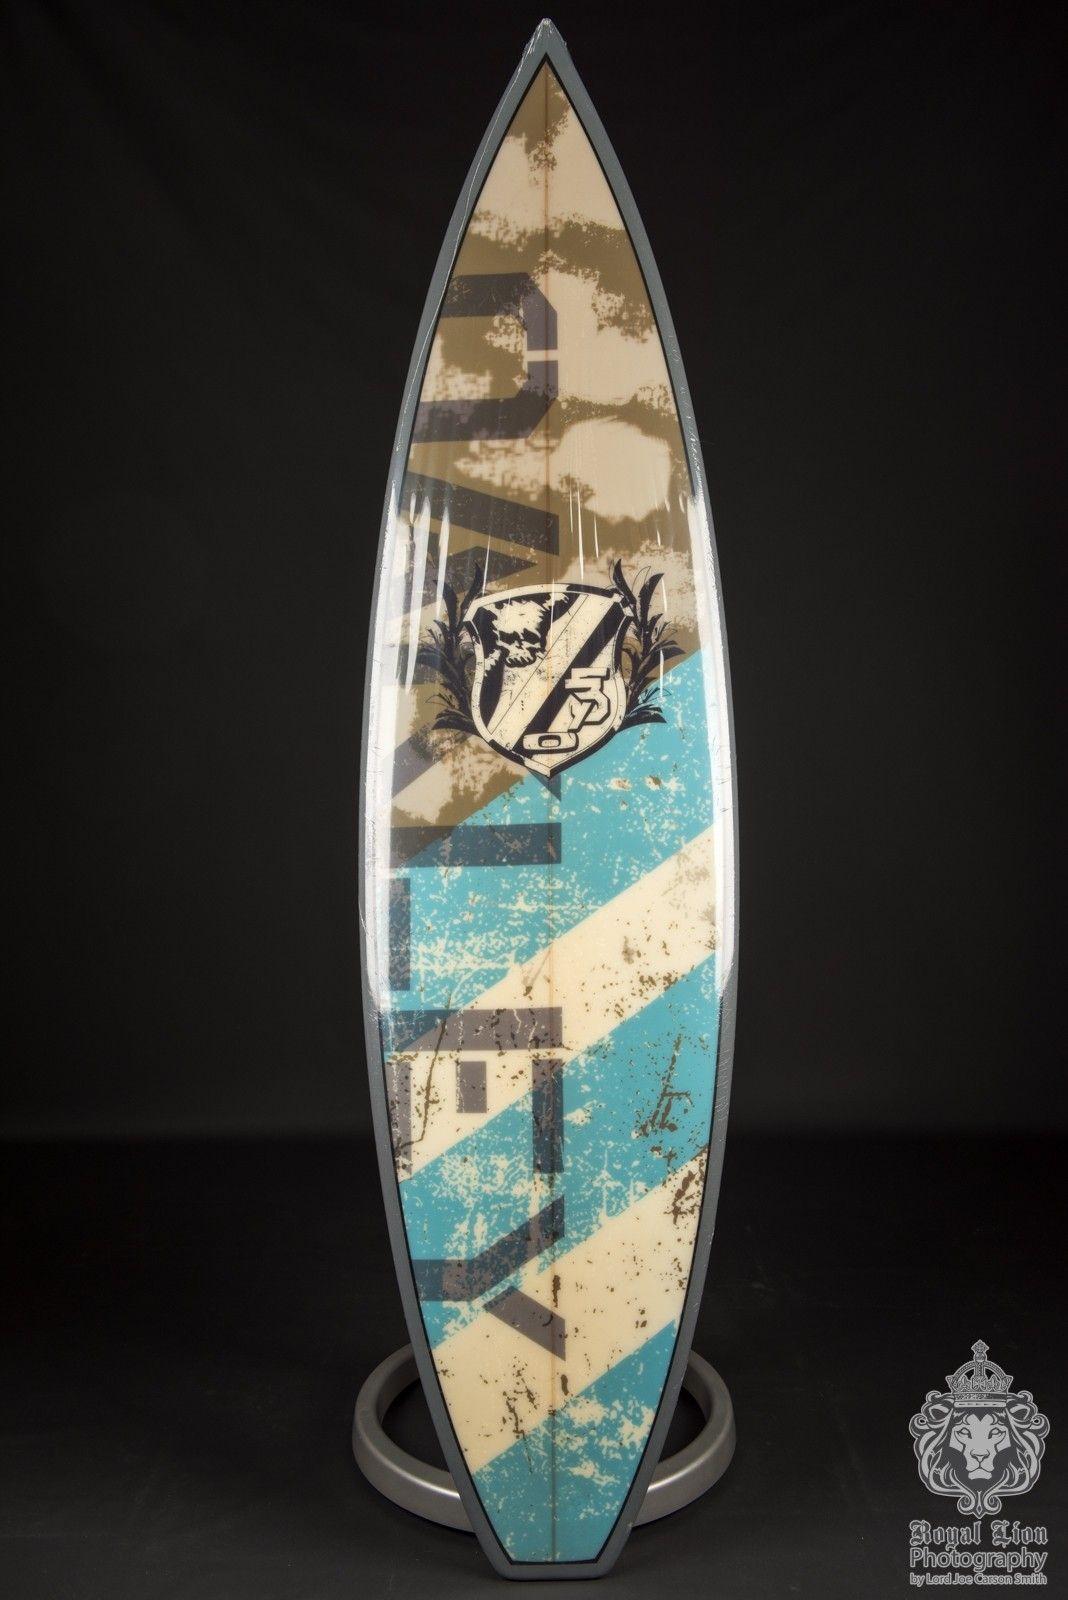 Flying Tiger Surfboard - Still in Shrink Wrap - Price Drop - ND8_3456.jpg